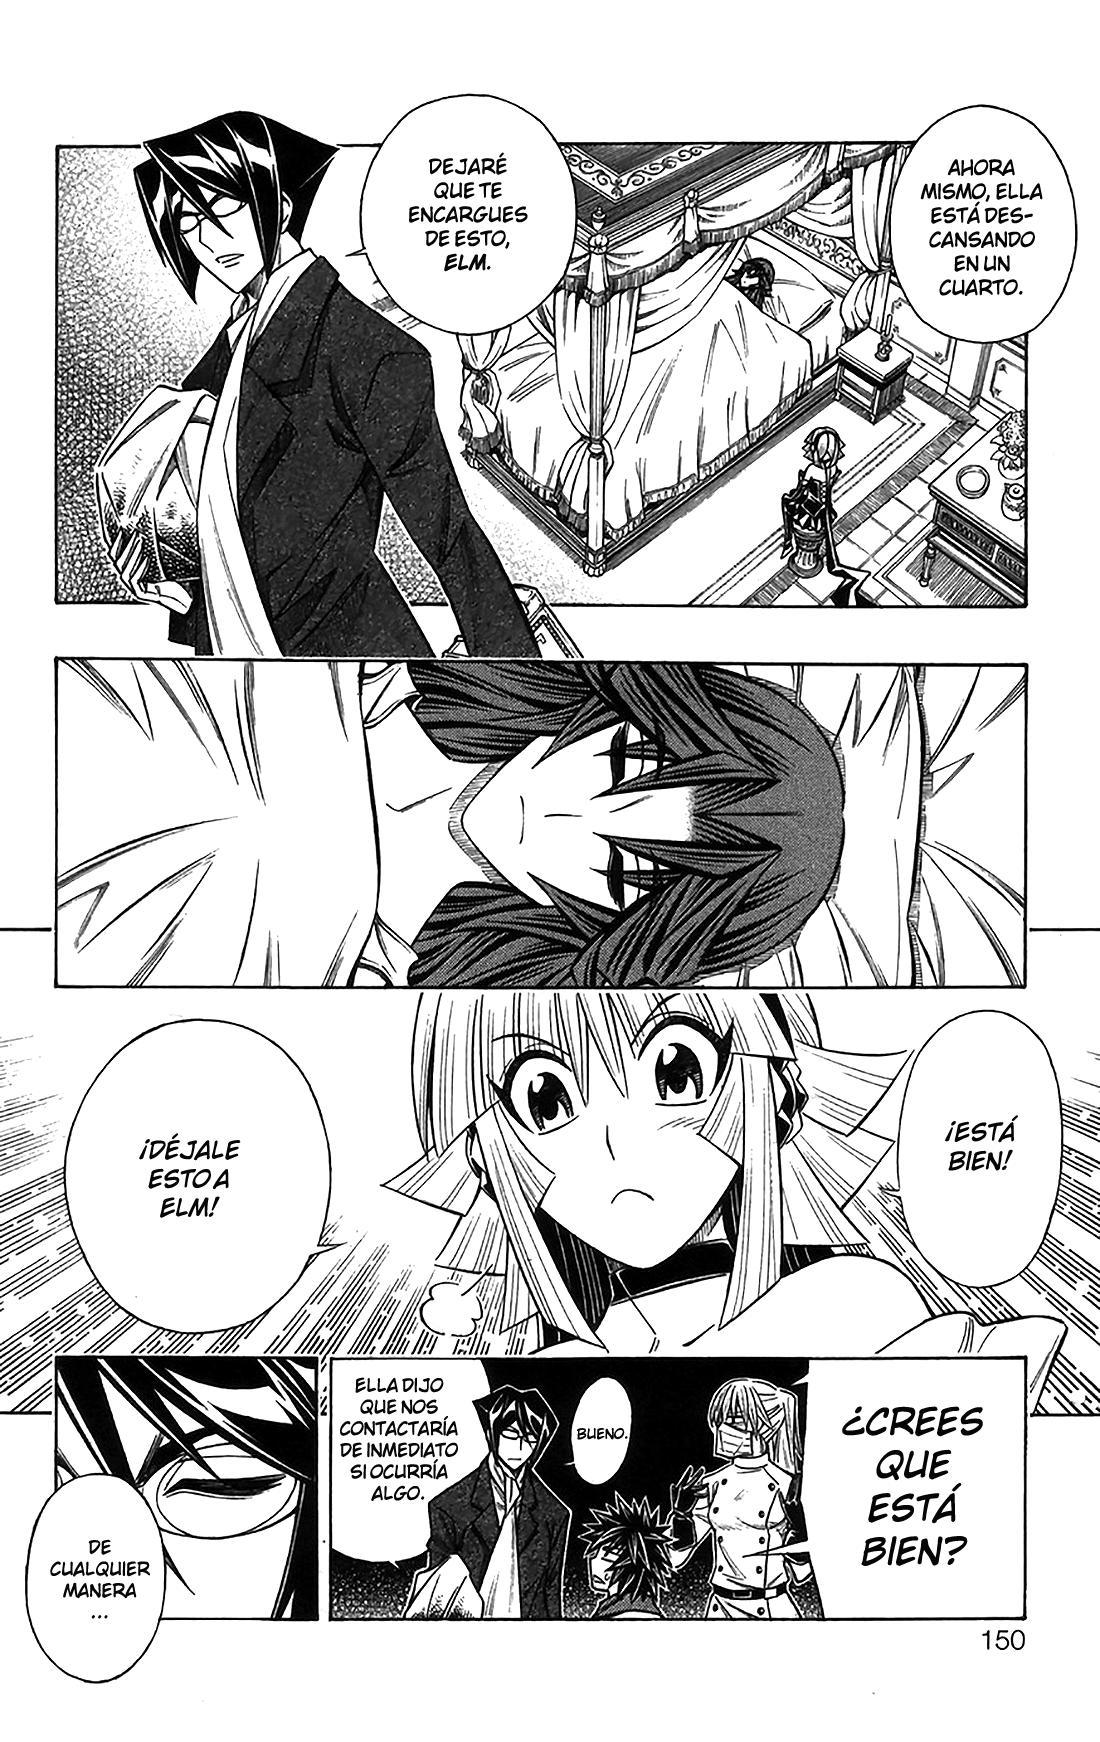 http://c5.ninemanga.com/es_manga/45/18797/447912/2e99e68e7c01590f28bf0b64e645f856.jpg Page 6